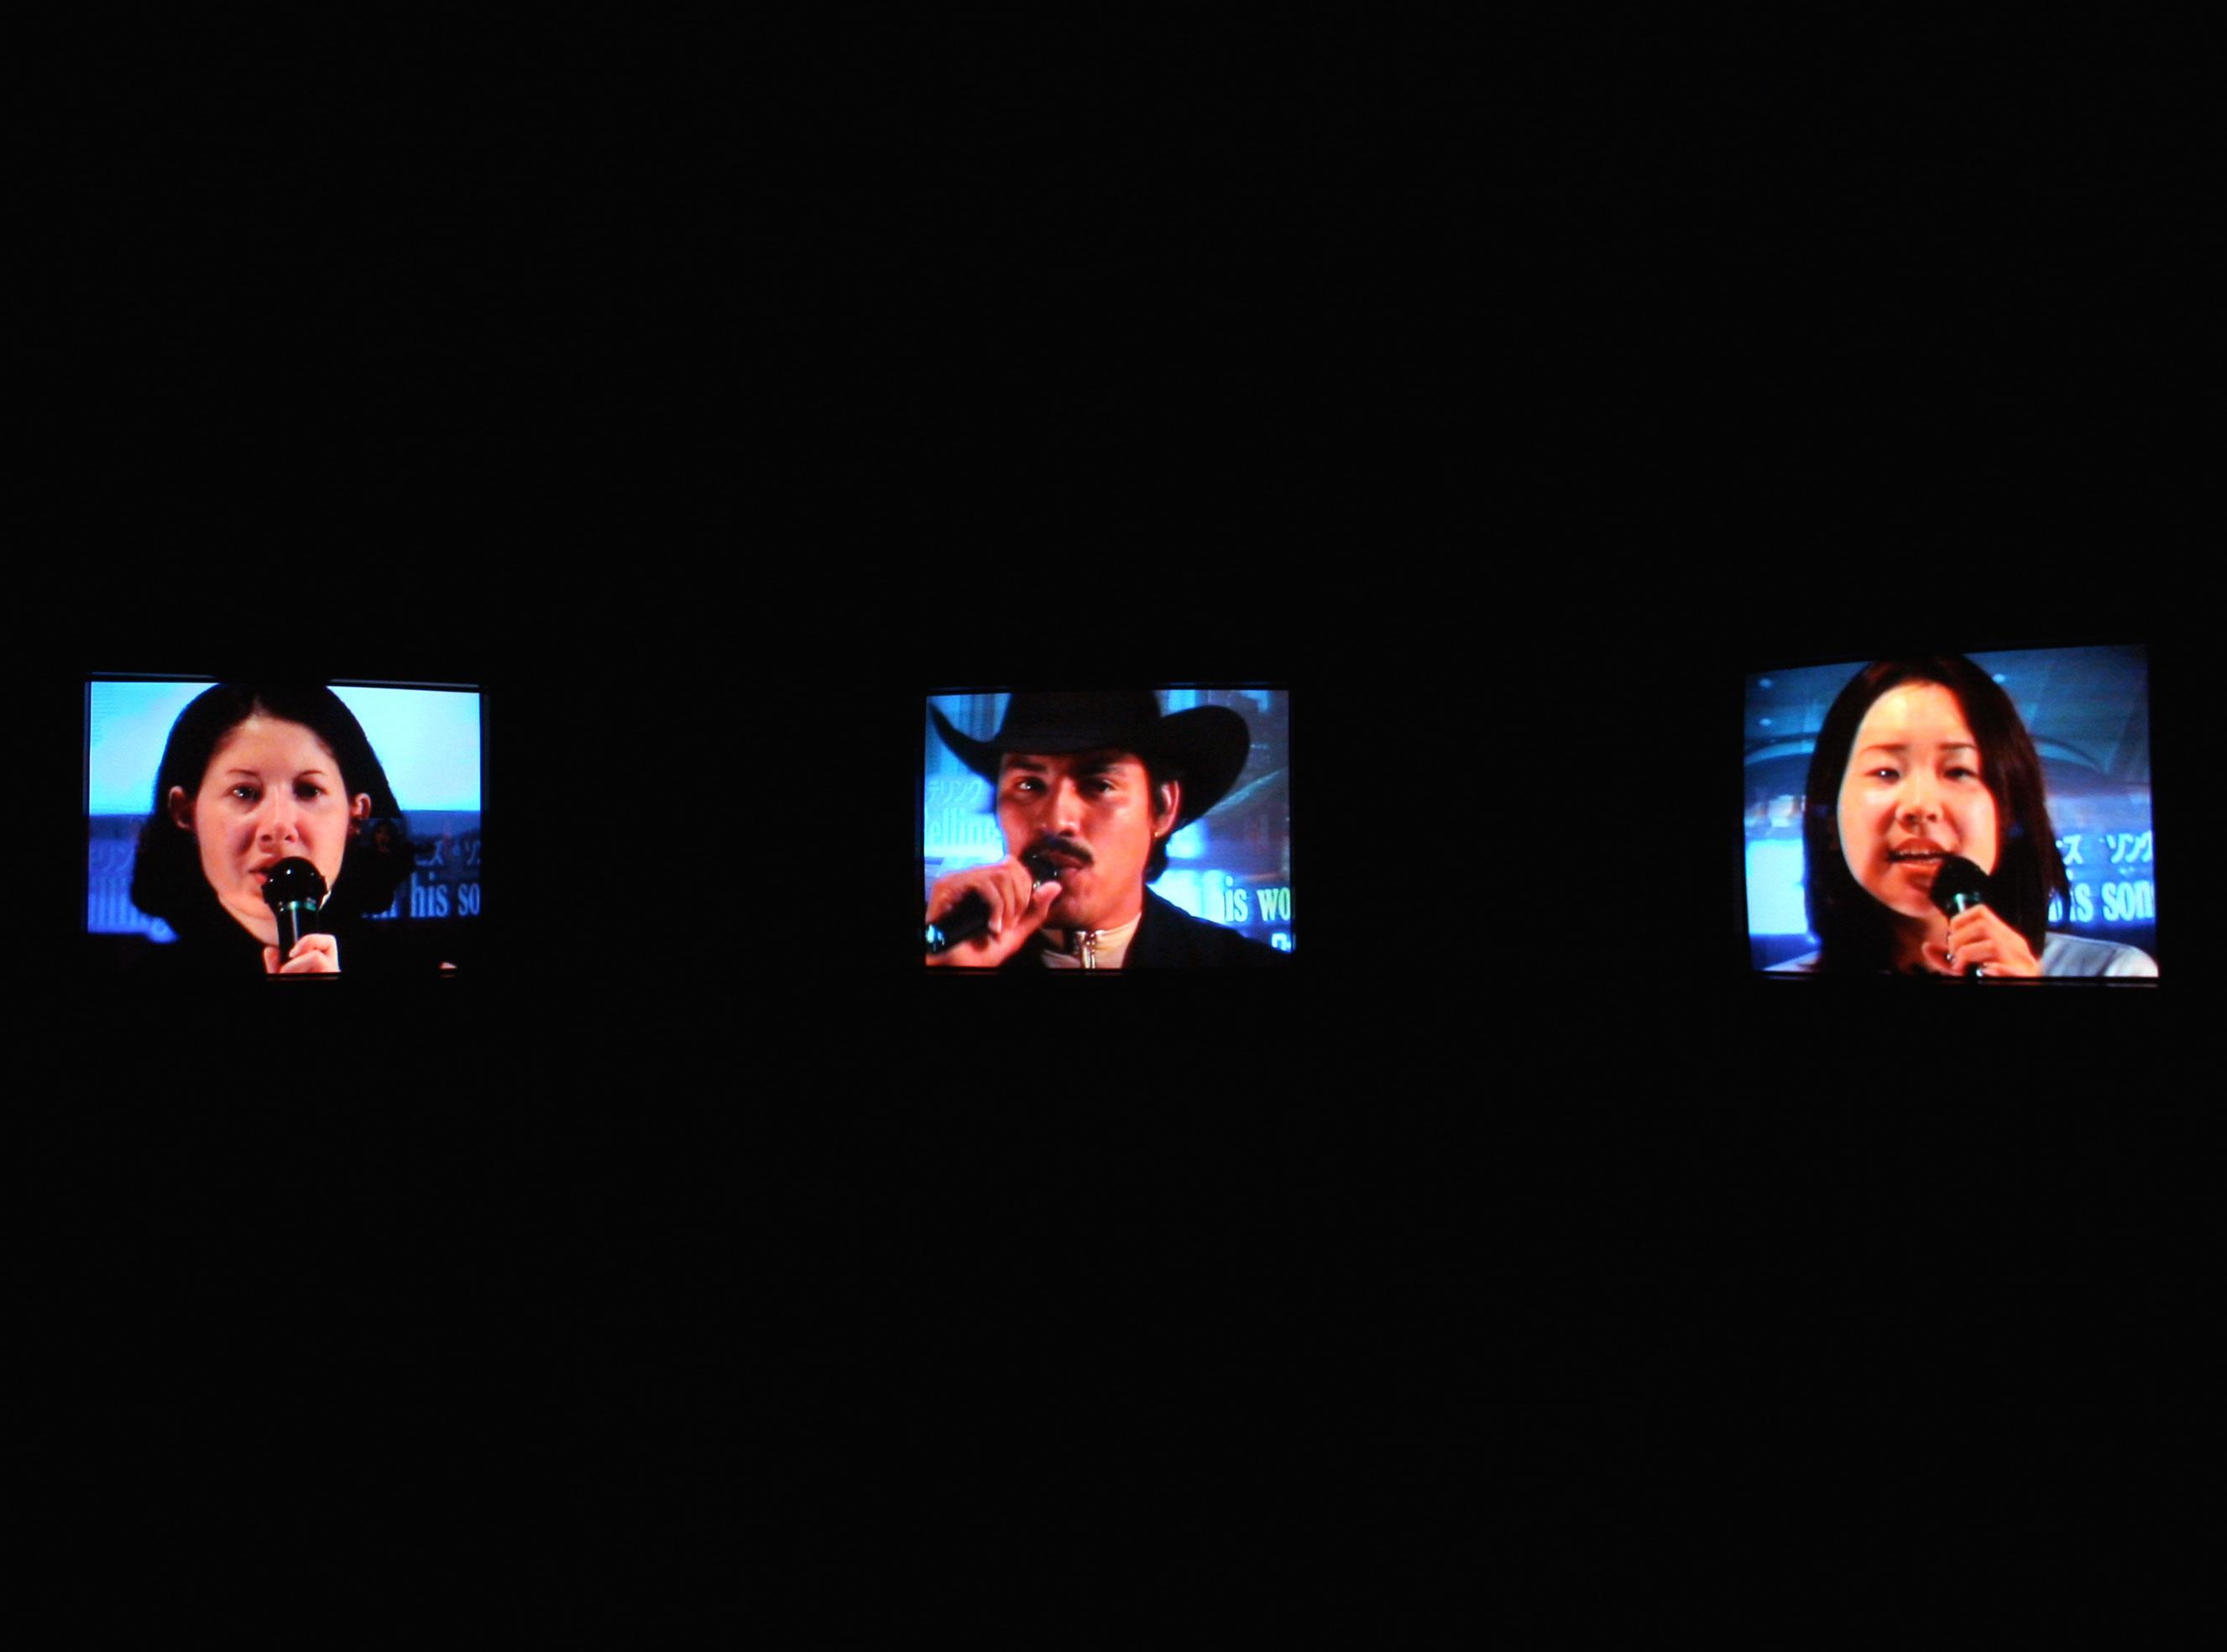 """Candice Breitz, Karaoke, 2008. Multi-channel video installation"""